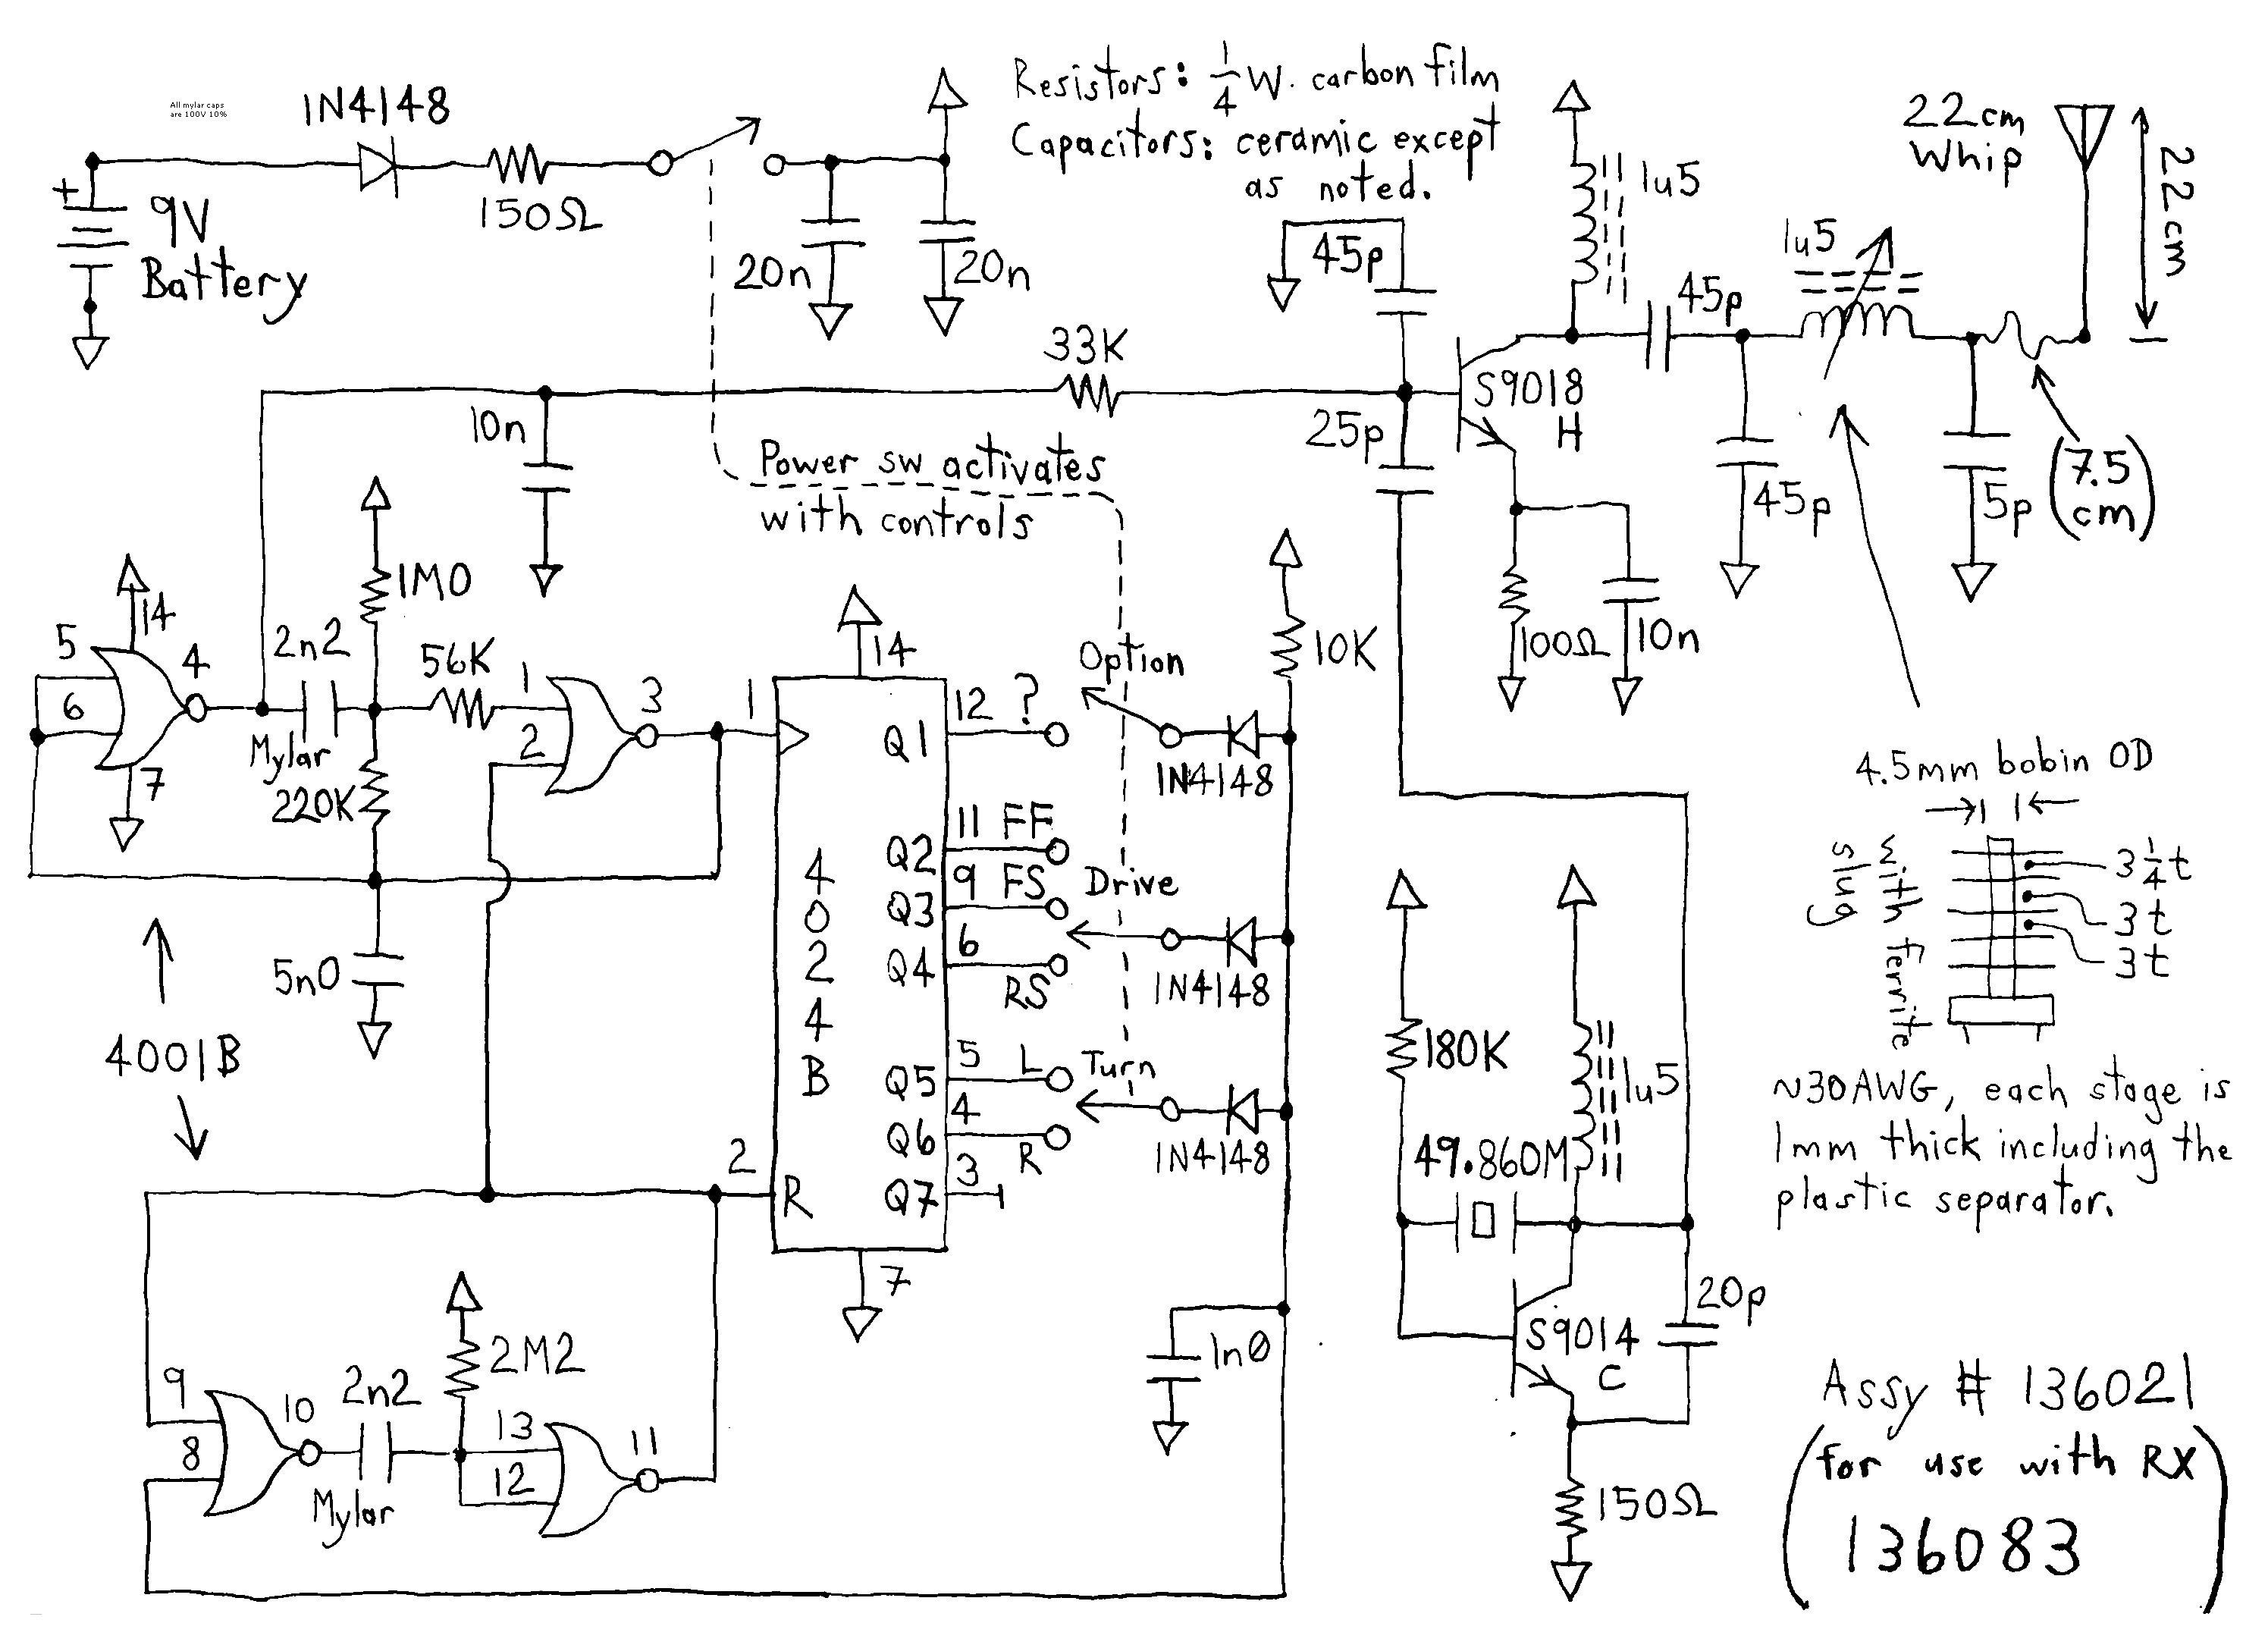 Generator Changeover Switch Wiring Diagram Generator Changeover Switch Wiring Diagram Australia Save 4 Way Of Generator Changeover Switch Wiring Diagram